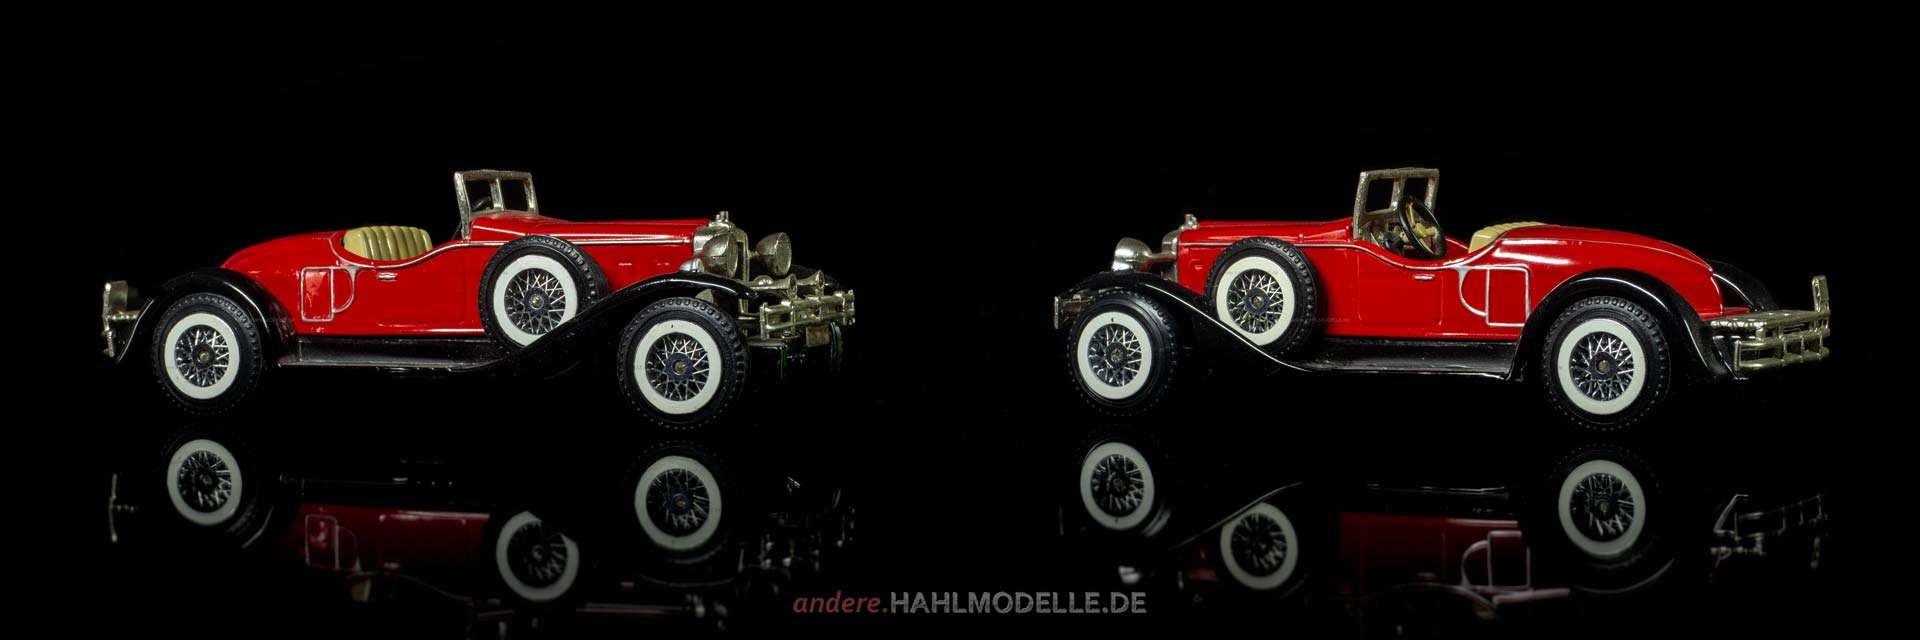 Stutz Bearcat | Roadster | Lesney Products & Co. Ltd., Matchbox – Models of Yesteryear | 1:43 | www.andere.hahlmodelle.de